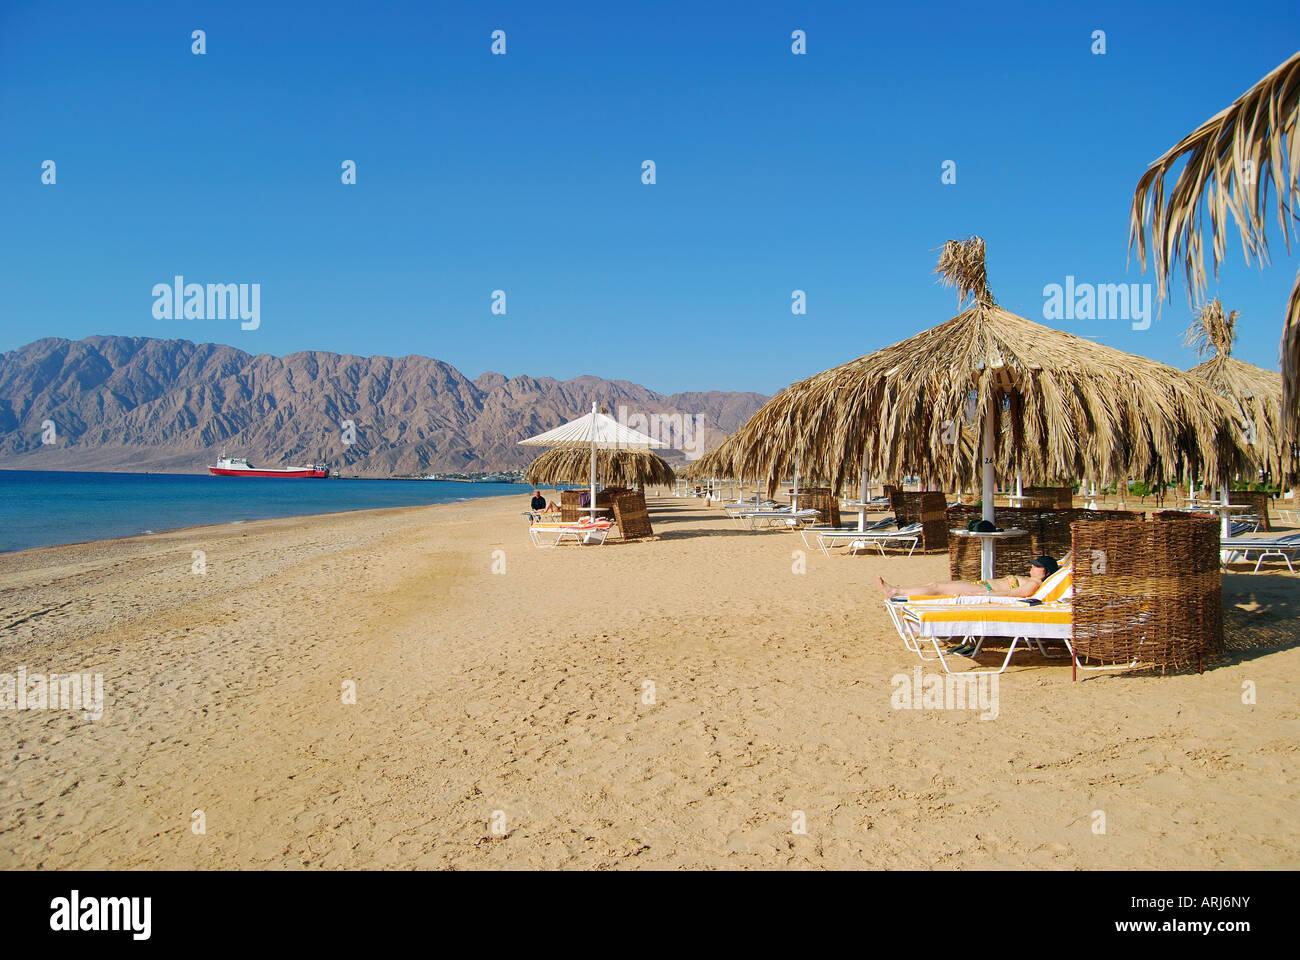 Hilton Nuweiba Coral Resort Hotel beach, Nuweiba, Sinai Peninsula, Republic of Egypt Stock Photo